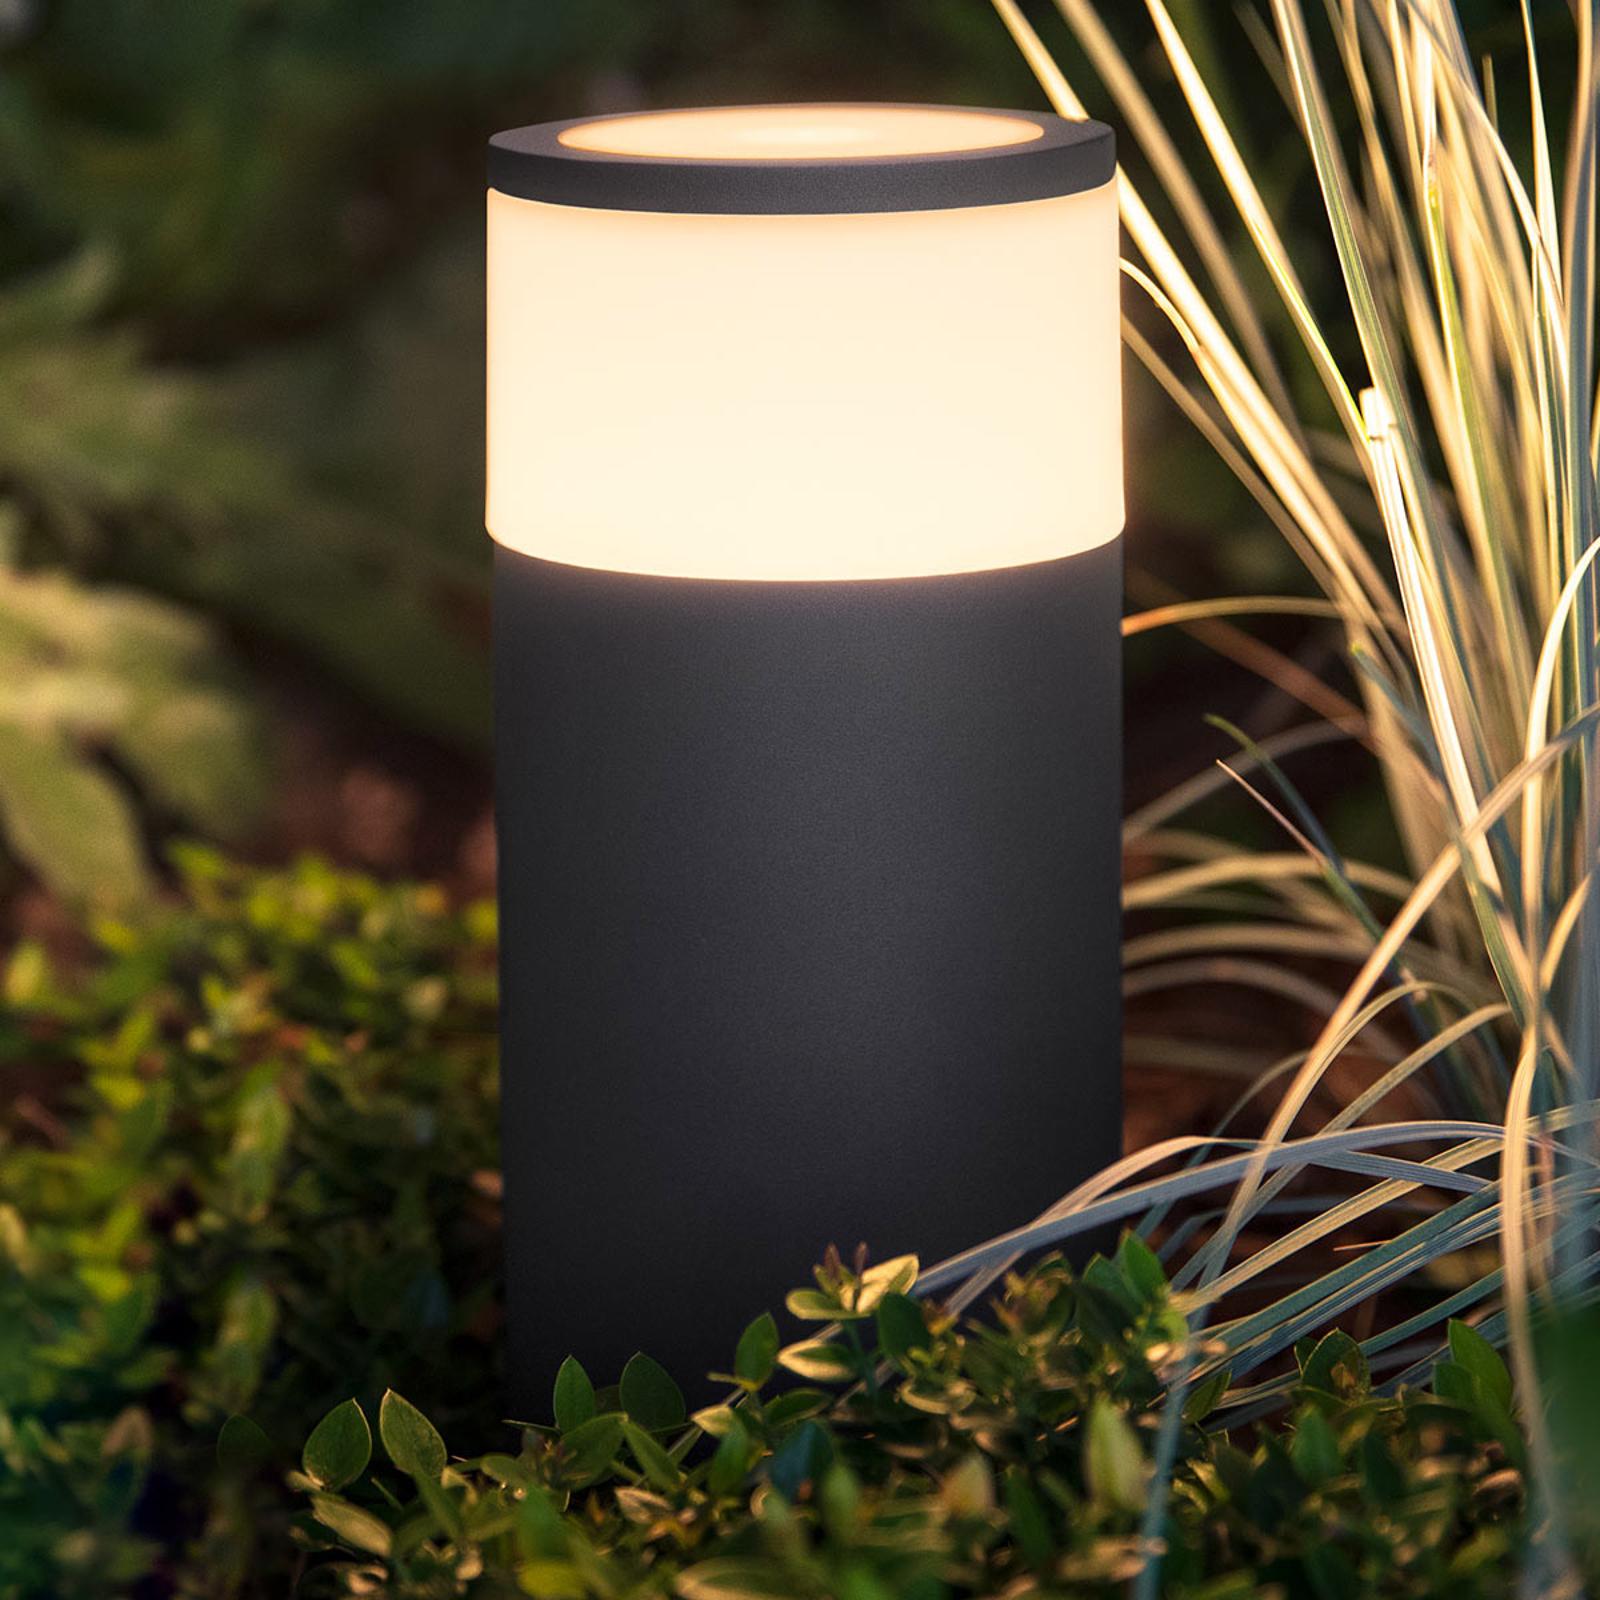 Philips Hue lampione a LED Calla set di base